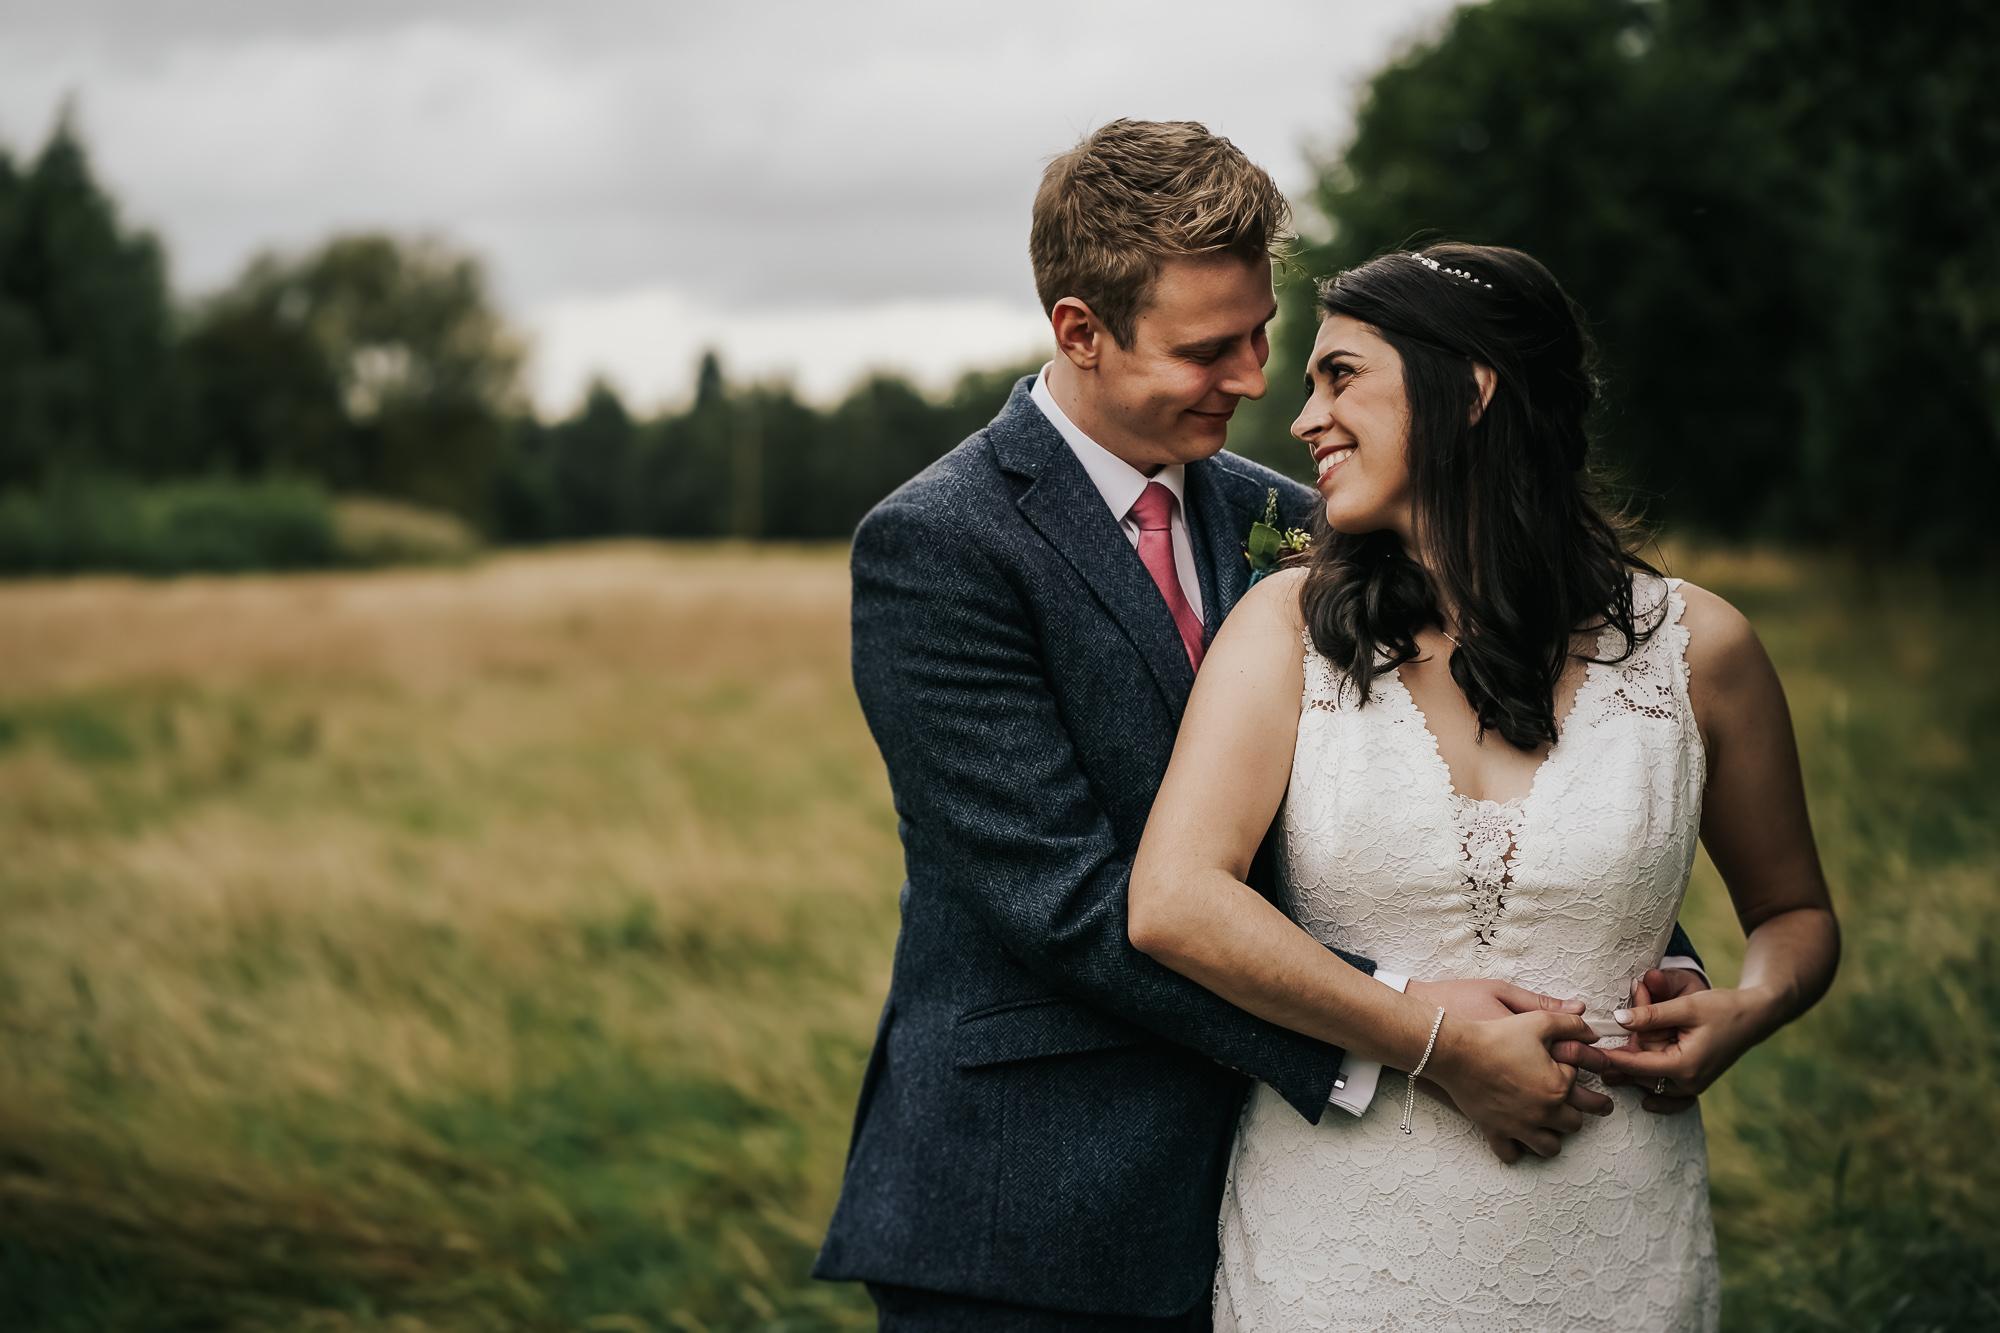 Oak tree of peover wedding photography cheshire wedding photographer (52 of 56).jpg